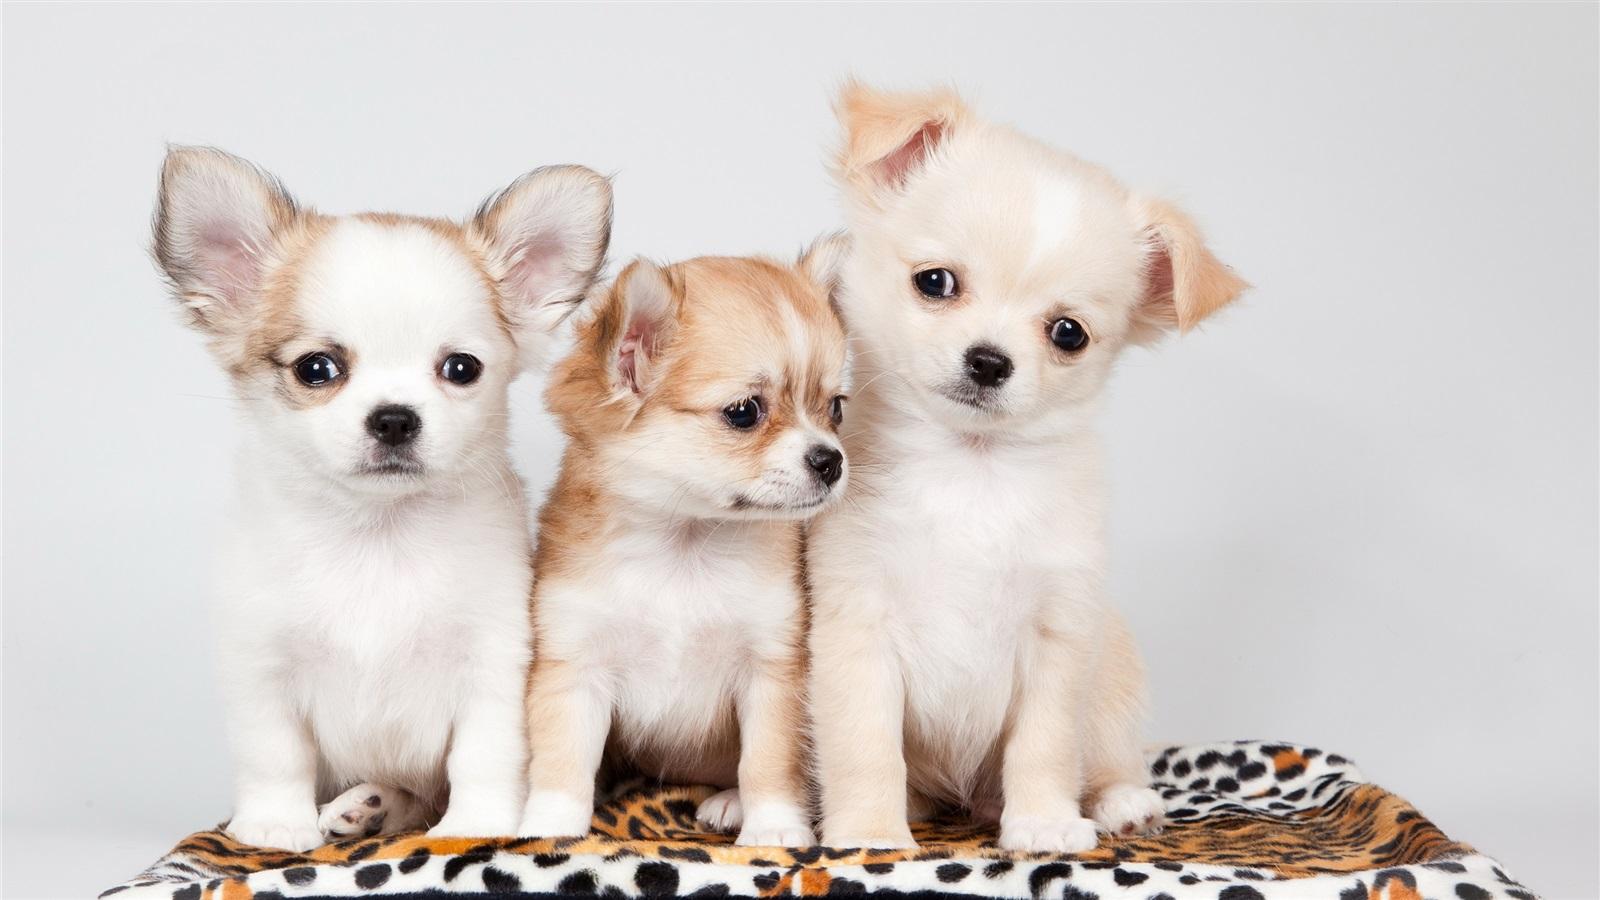 So cute puppies wallpaper 15897245 fanpop - Three Dogs Cute Wallpaper 1600x900 Resolution Wallpaper Download Cute Dogs Wallpaper